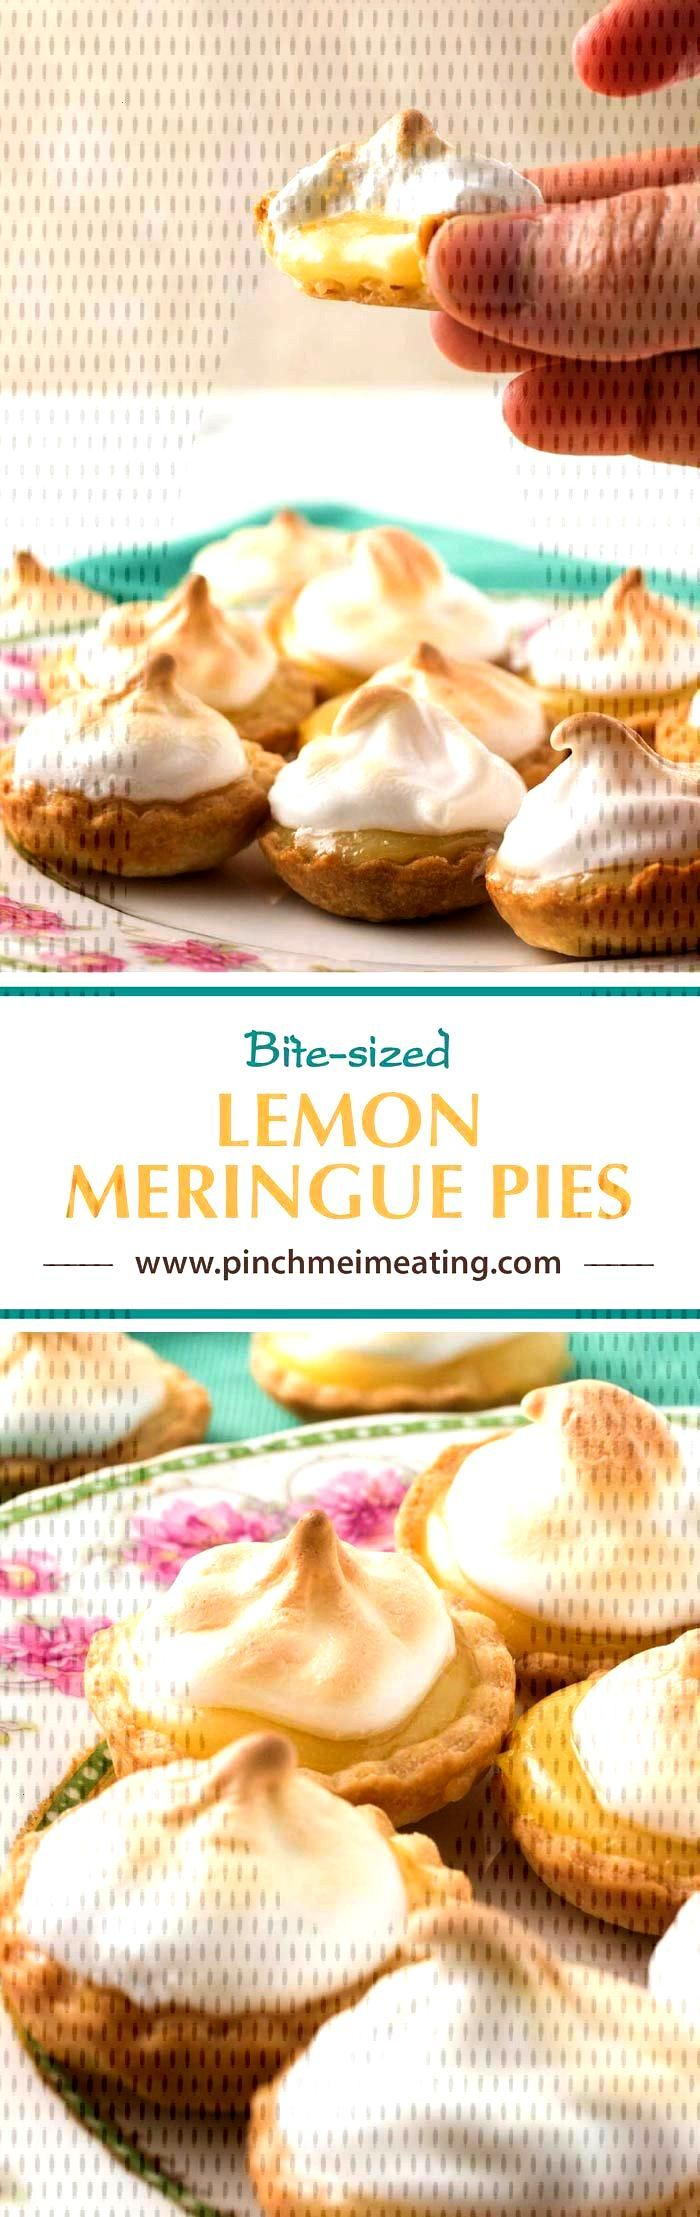 Mini Lemon Meringue Pies   Pinch me, Im eating! -